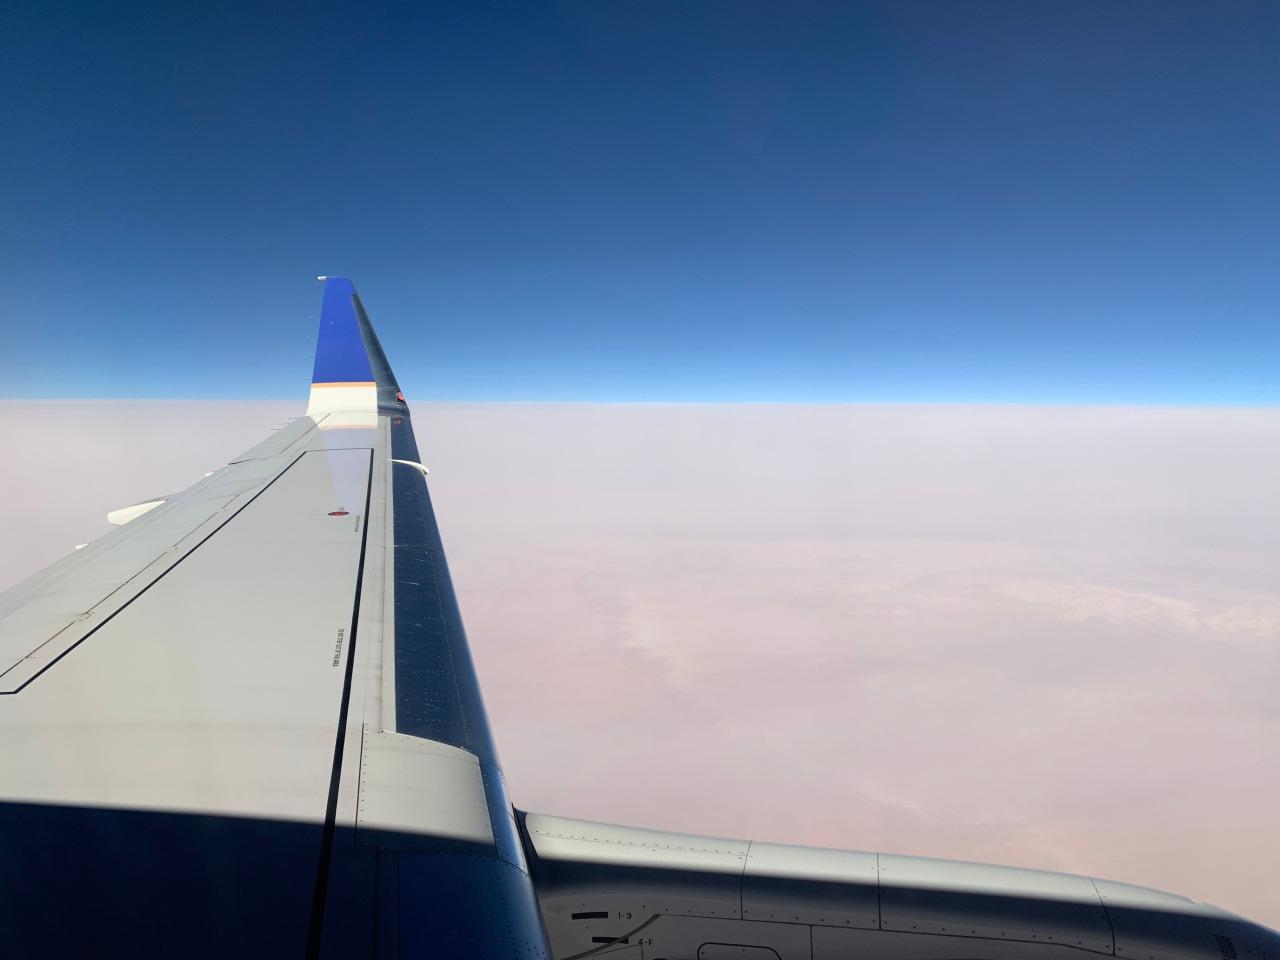 A smoke filledlandscape